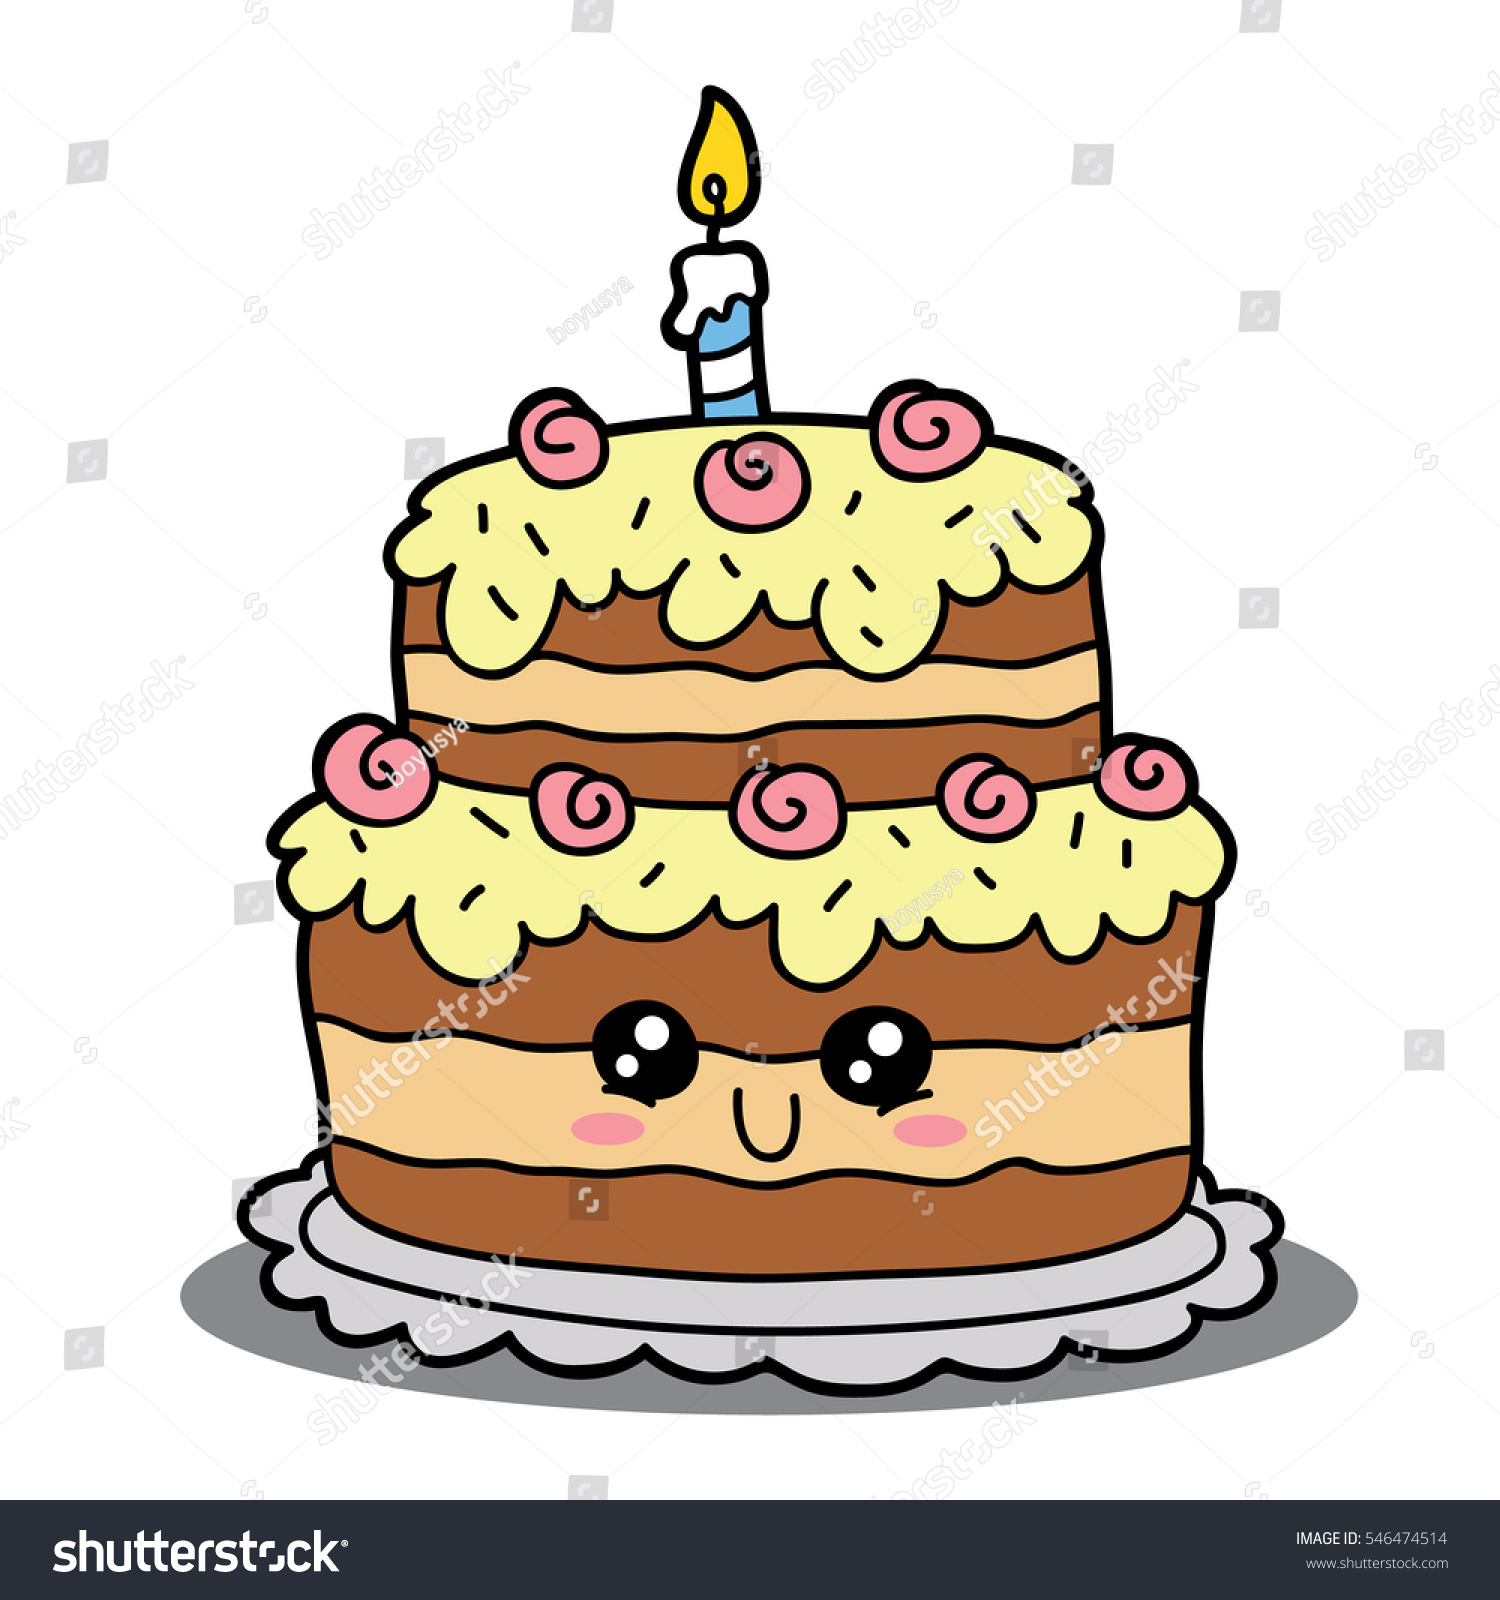 Vector Illustration Cute Cartoon Birthday Cake Stock Vector Royalty